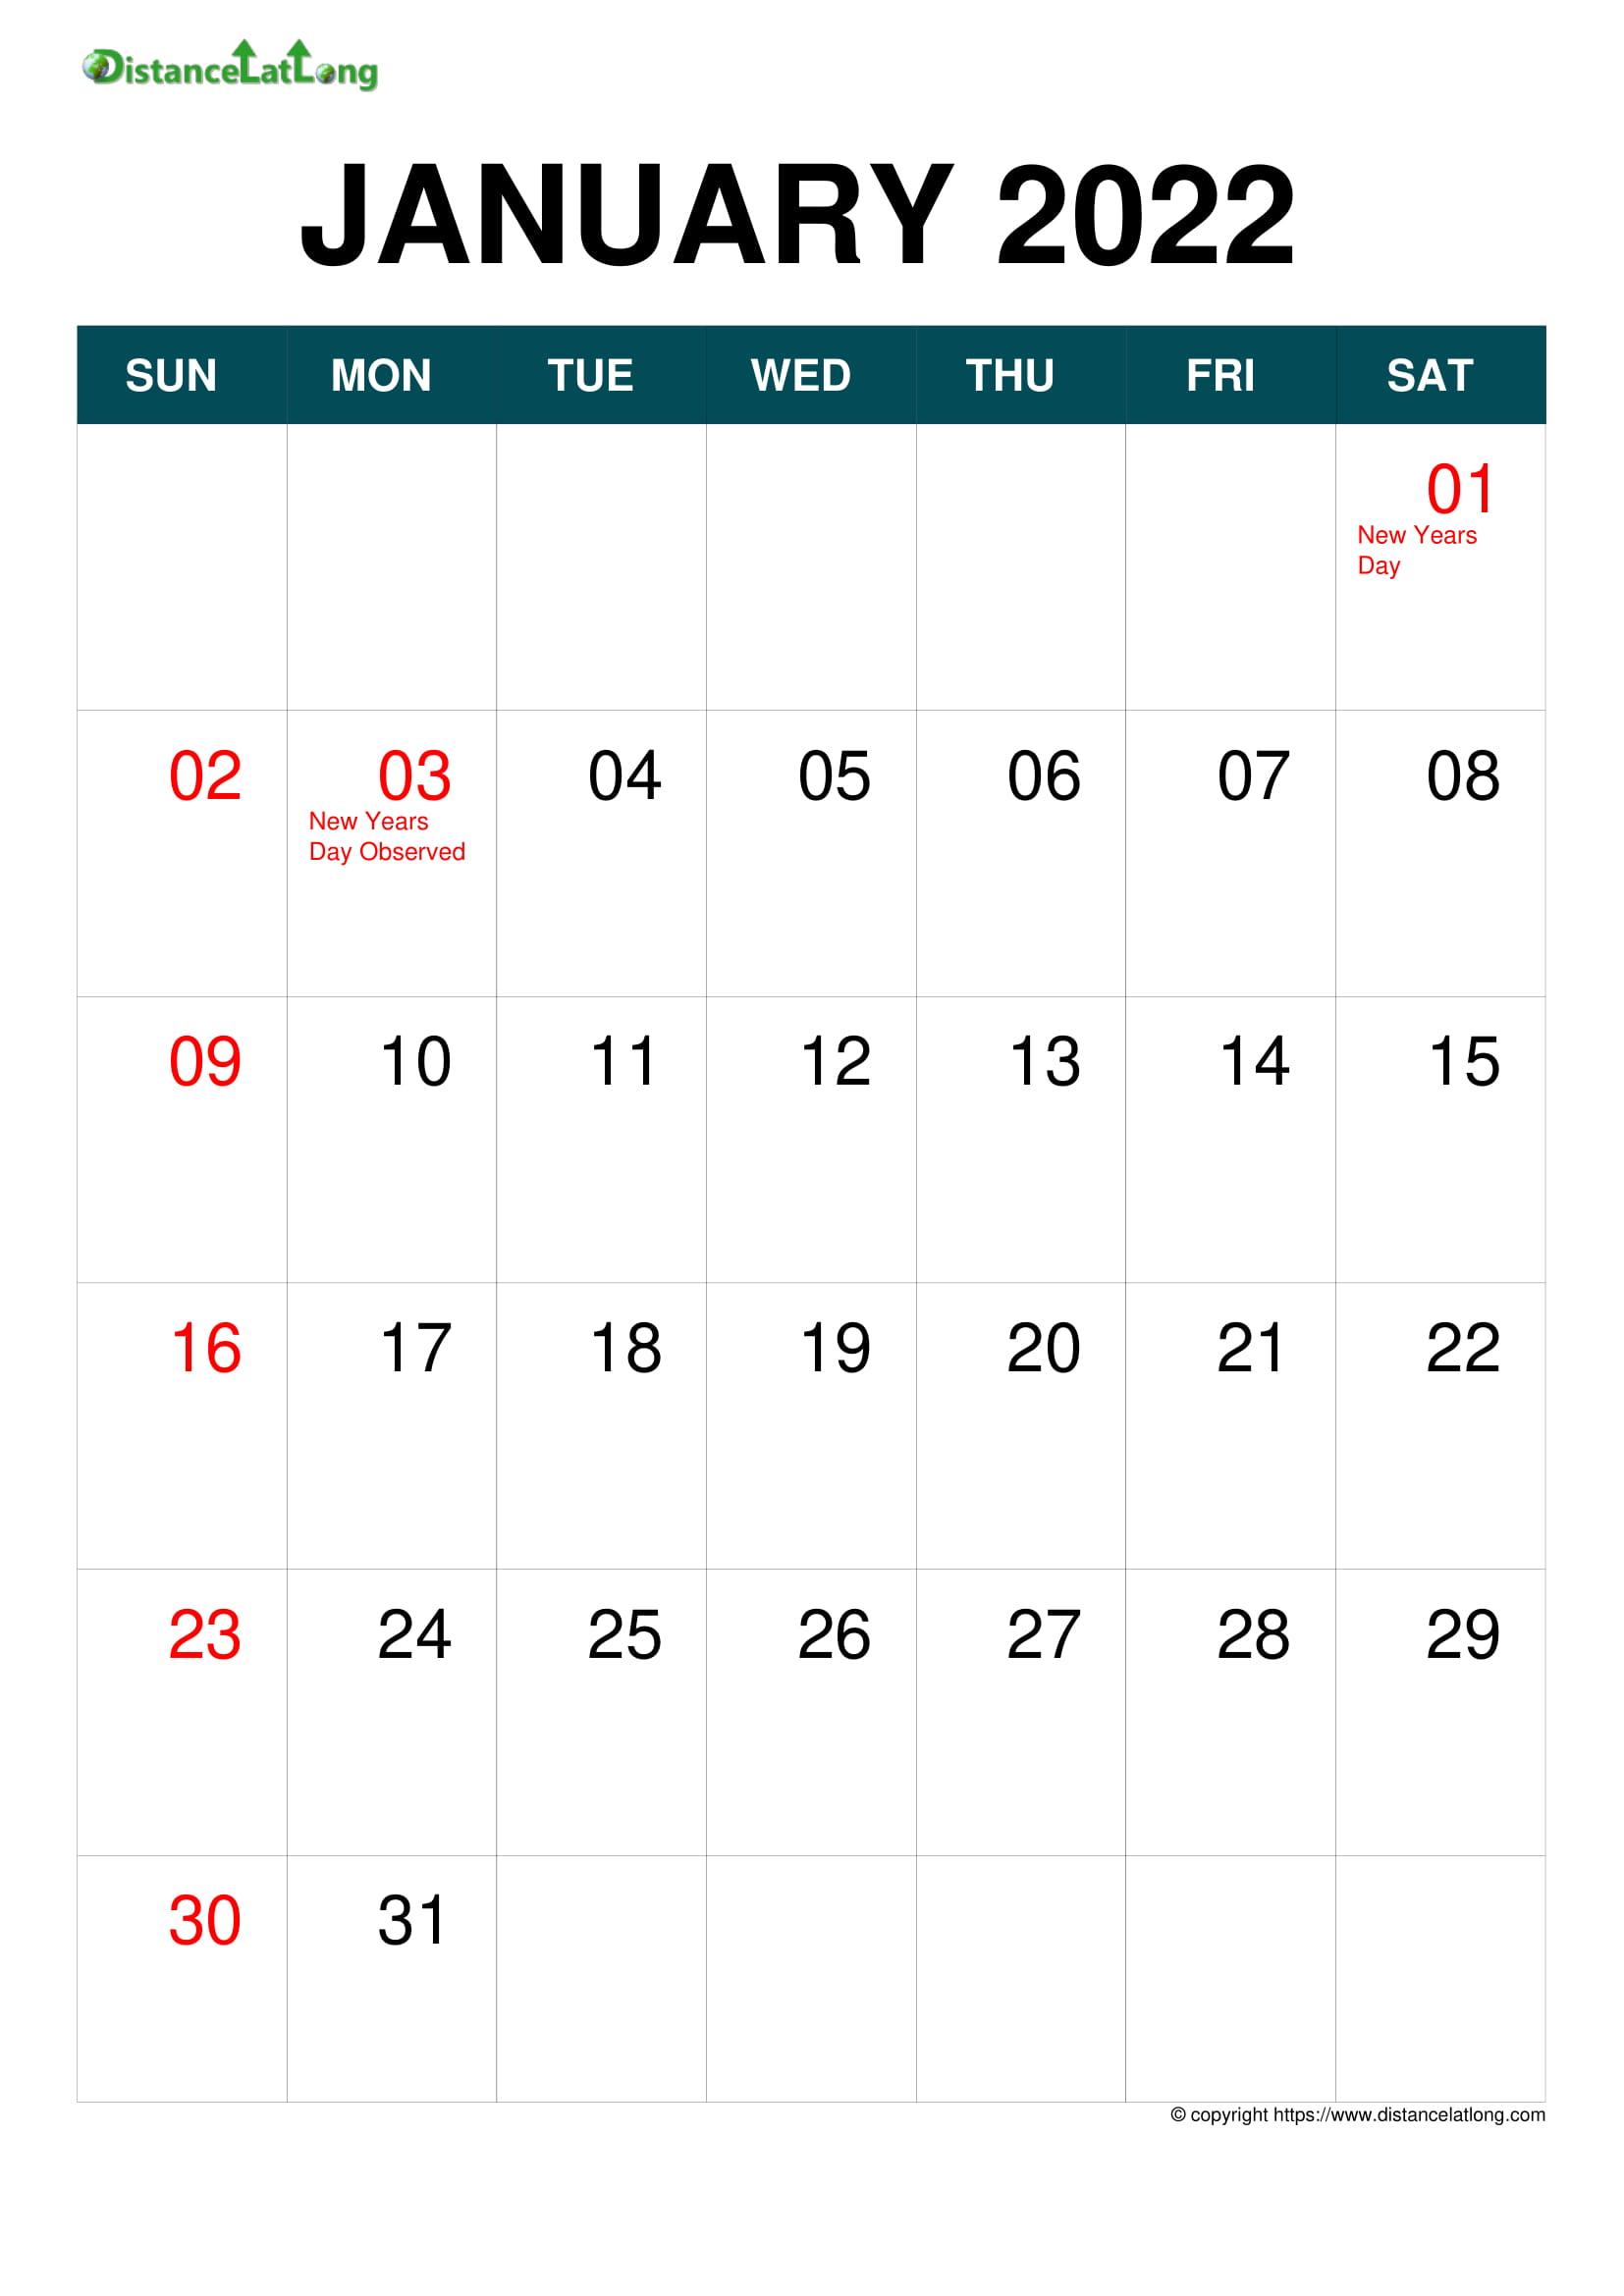 Printable December 2022 Calendar Word.2022 Holiday Calendar Portrait Orientation Free Printable Templates Free Download Distancelatlong Com